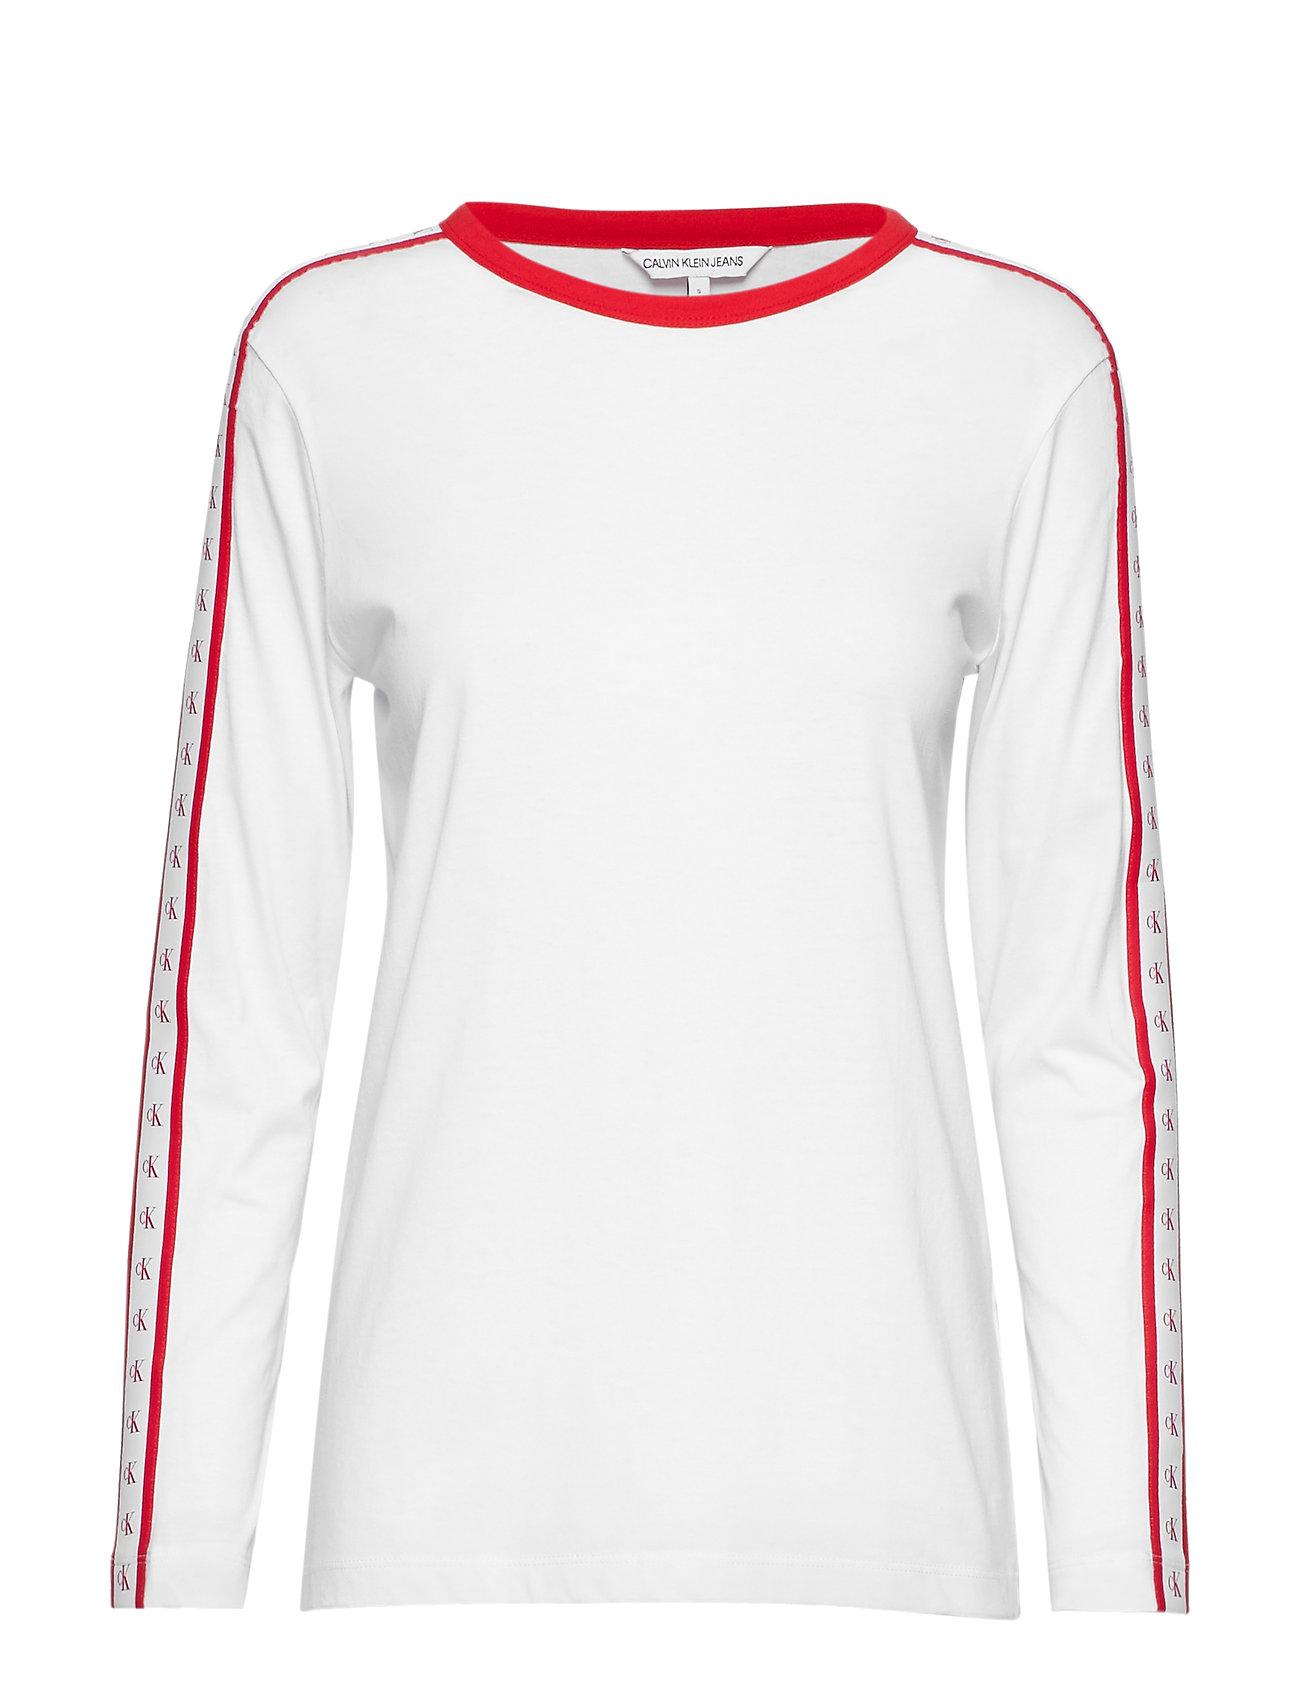 Calvin Klein Jeans MONOGRAM TAPE STRAIG - BRIGHT WHITE / RED